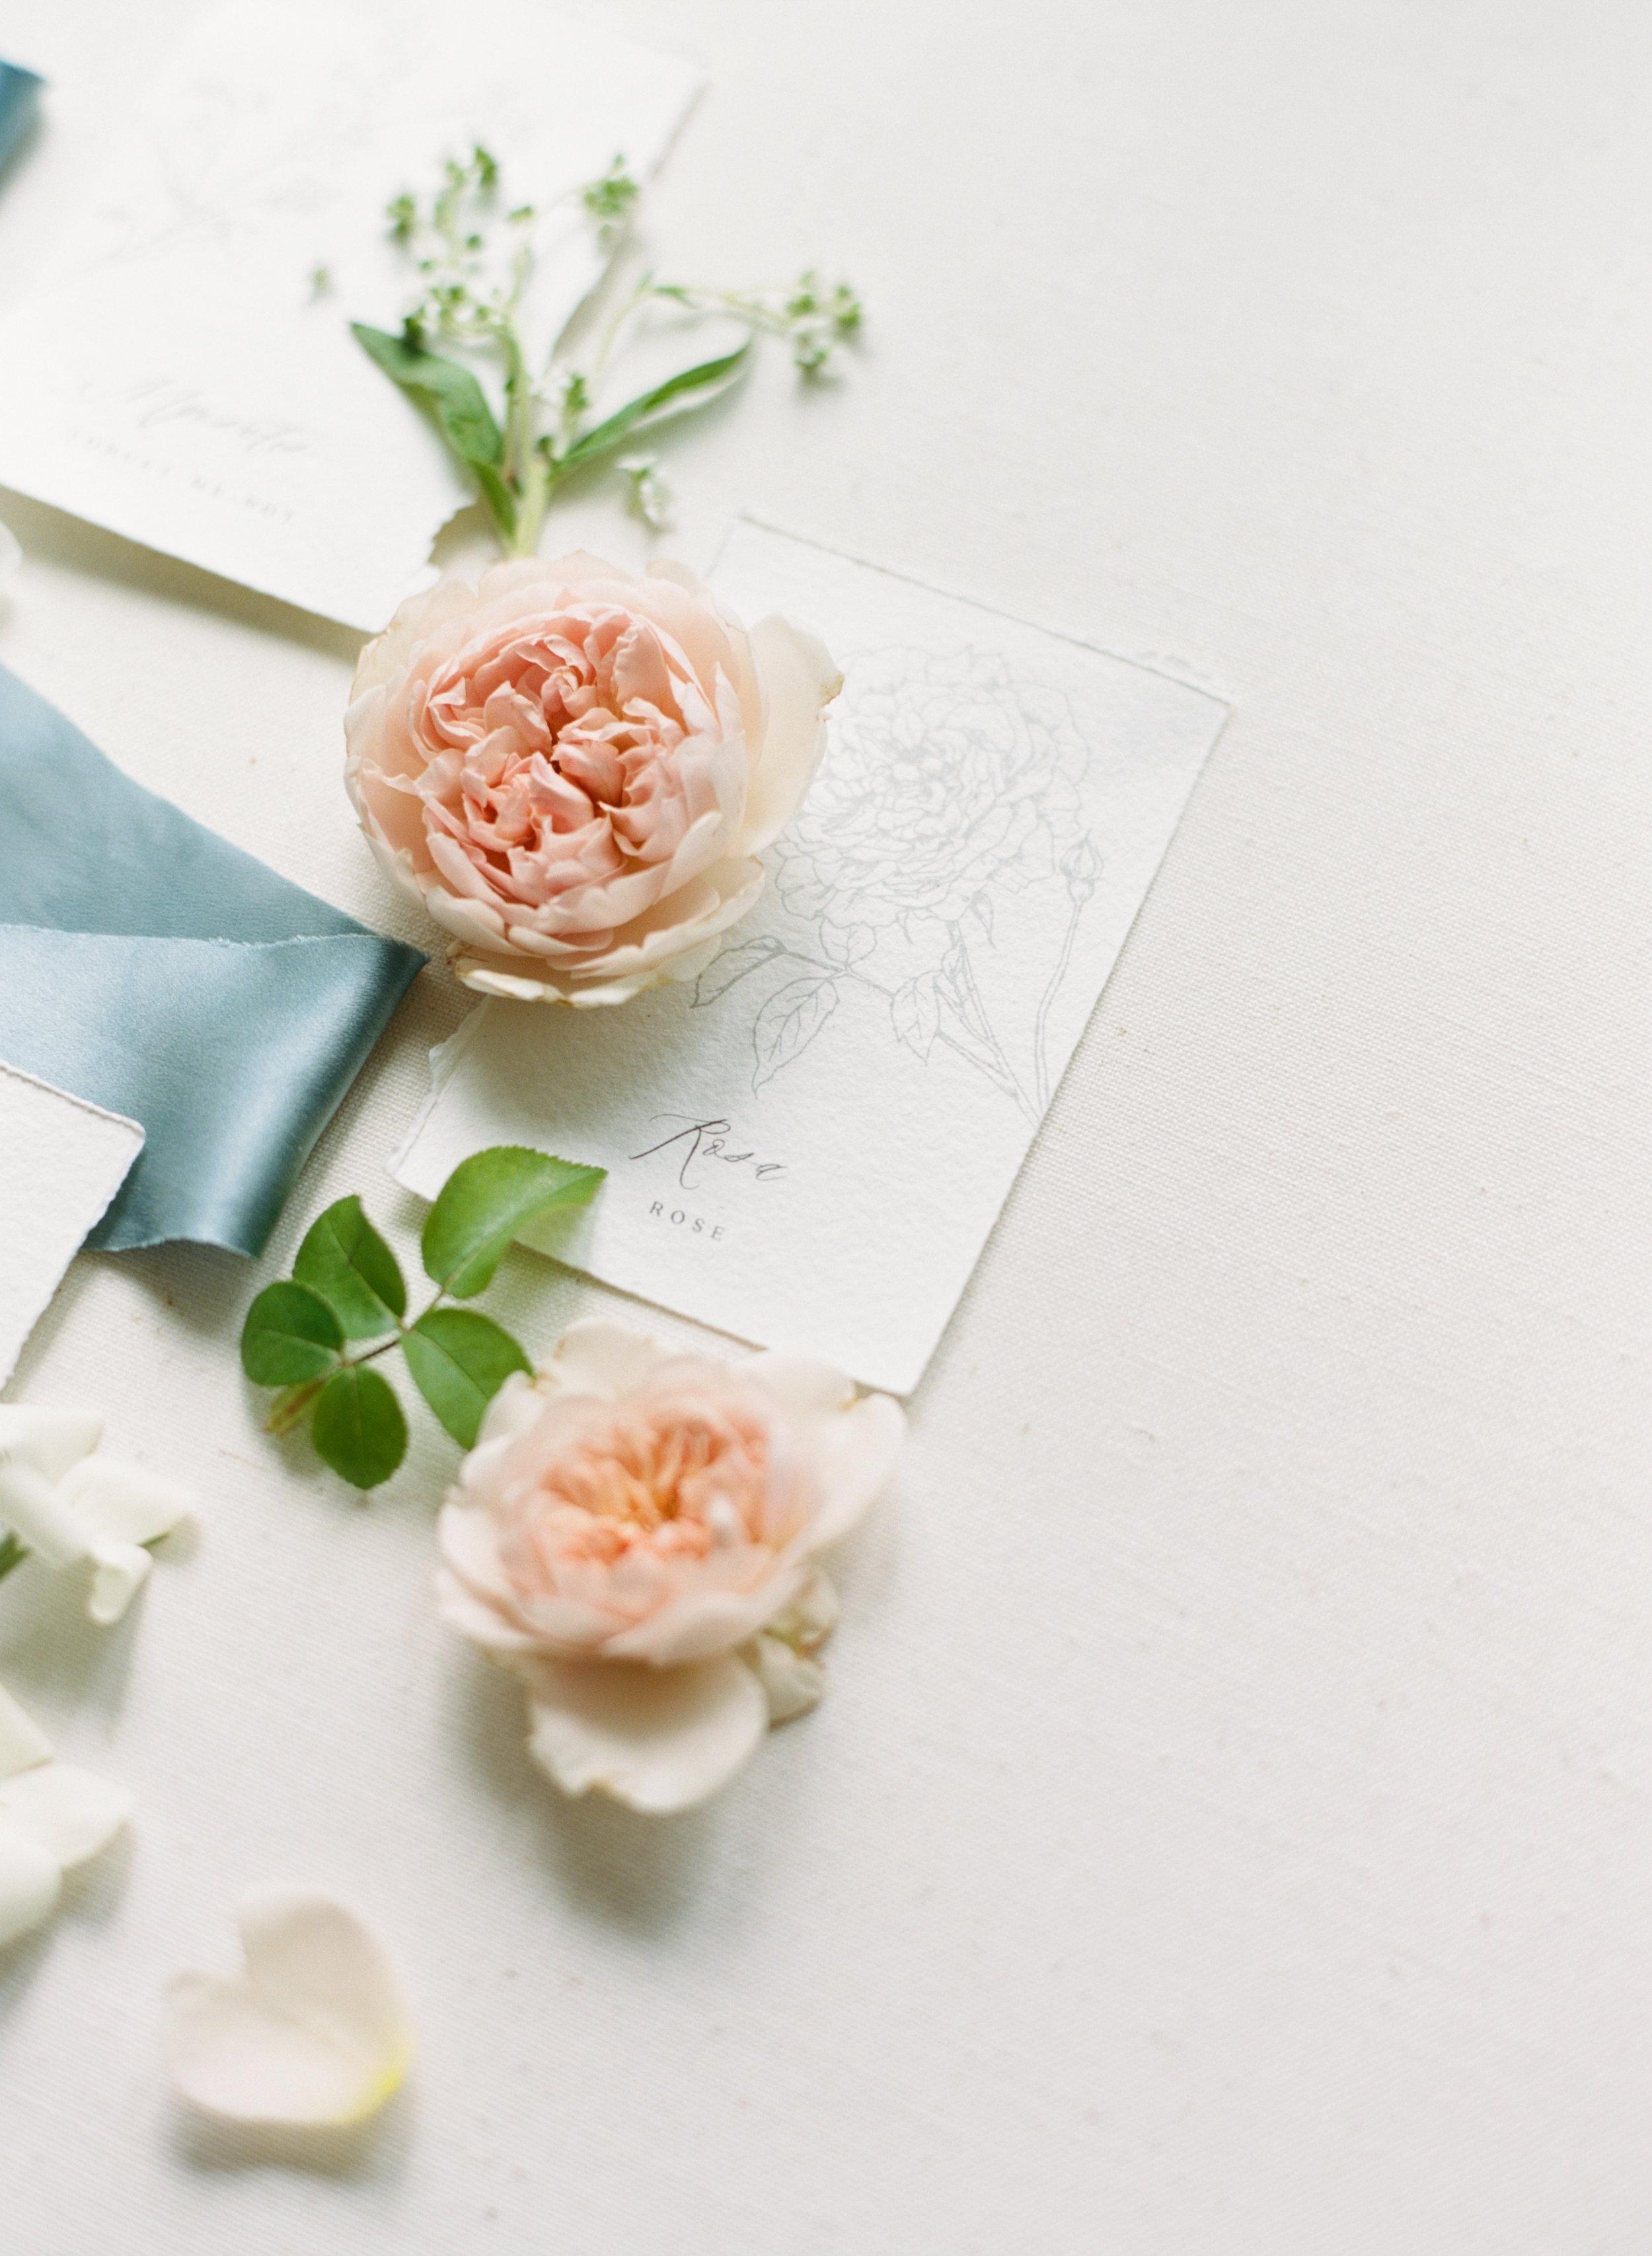 alexandra-meseke-understated-soft-luxury-wedding-upstate-ny_0016.jpg